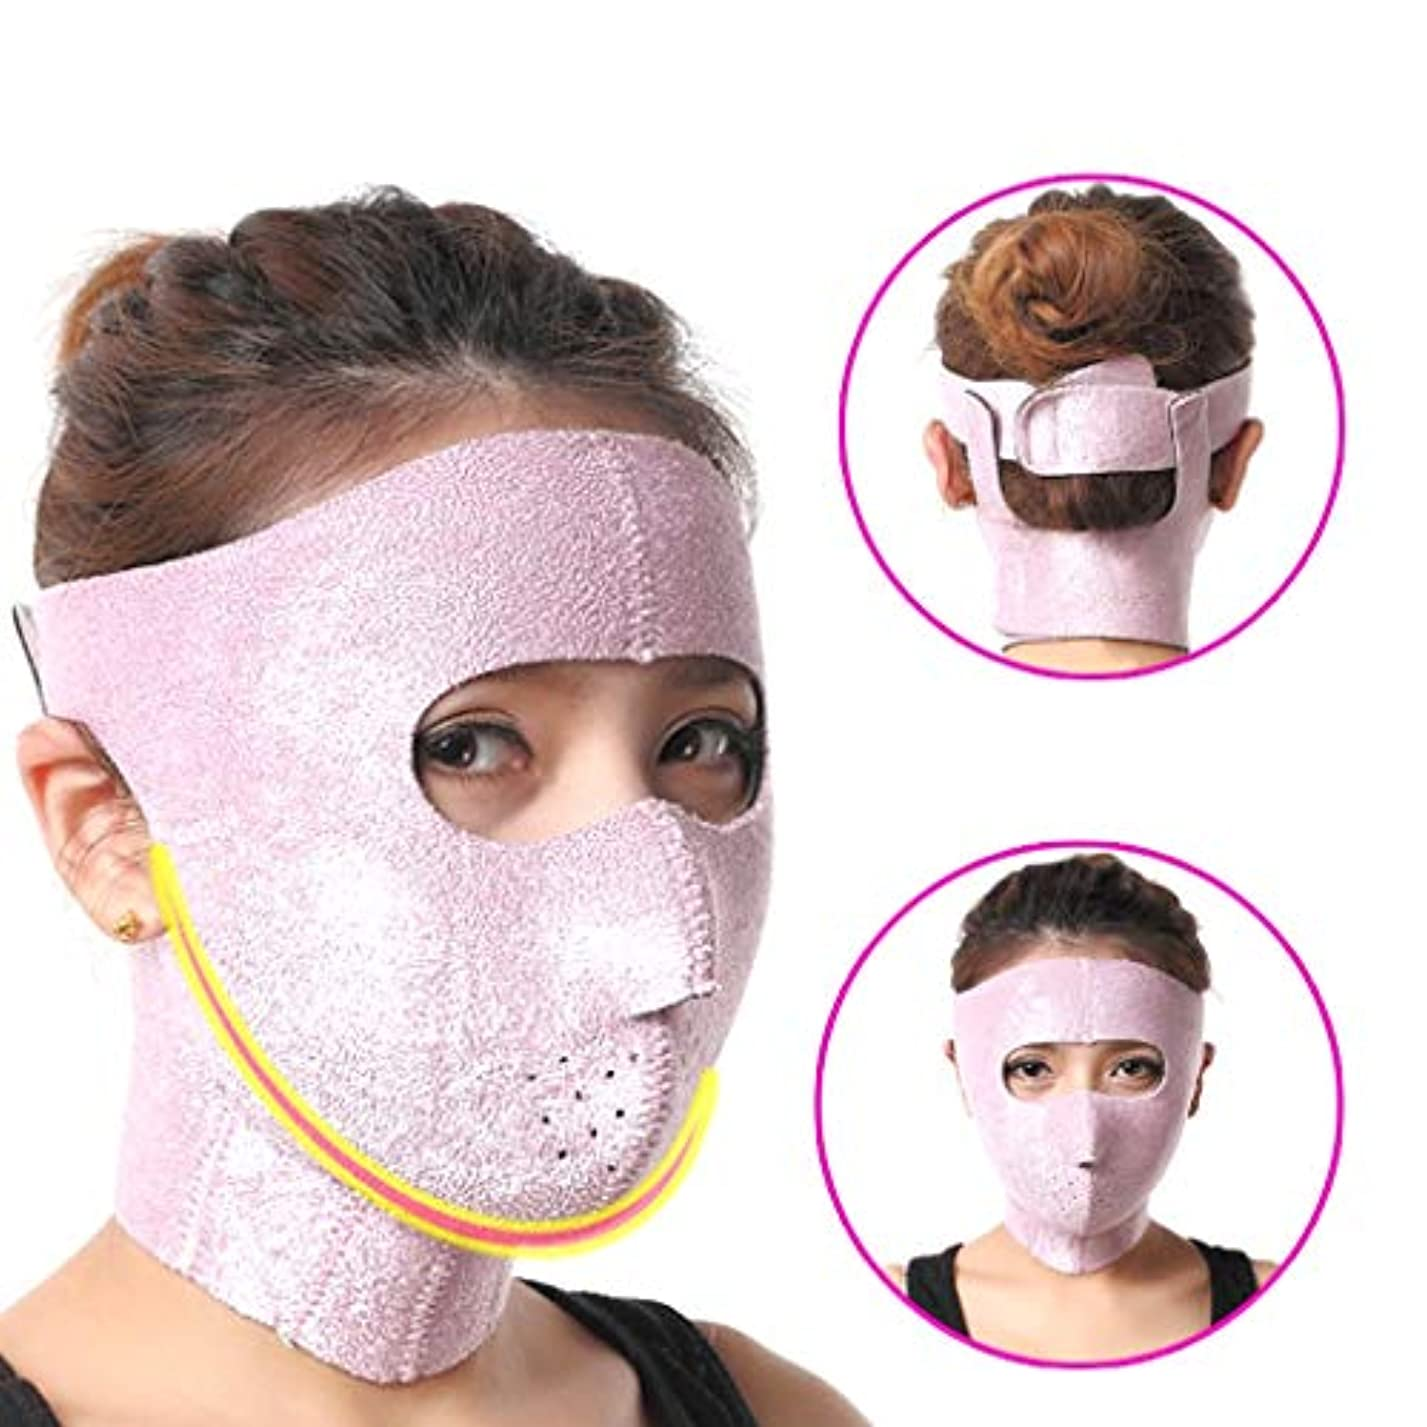 XHLMRMJ 薄いあご修正ツール、顔リフティングマスク、リフティングファーミング、Vフェイシャルマスク、改良された咬筋二重あご、男性と女性の両方に適しています